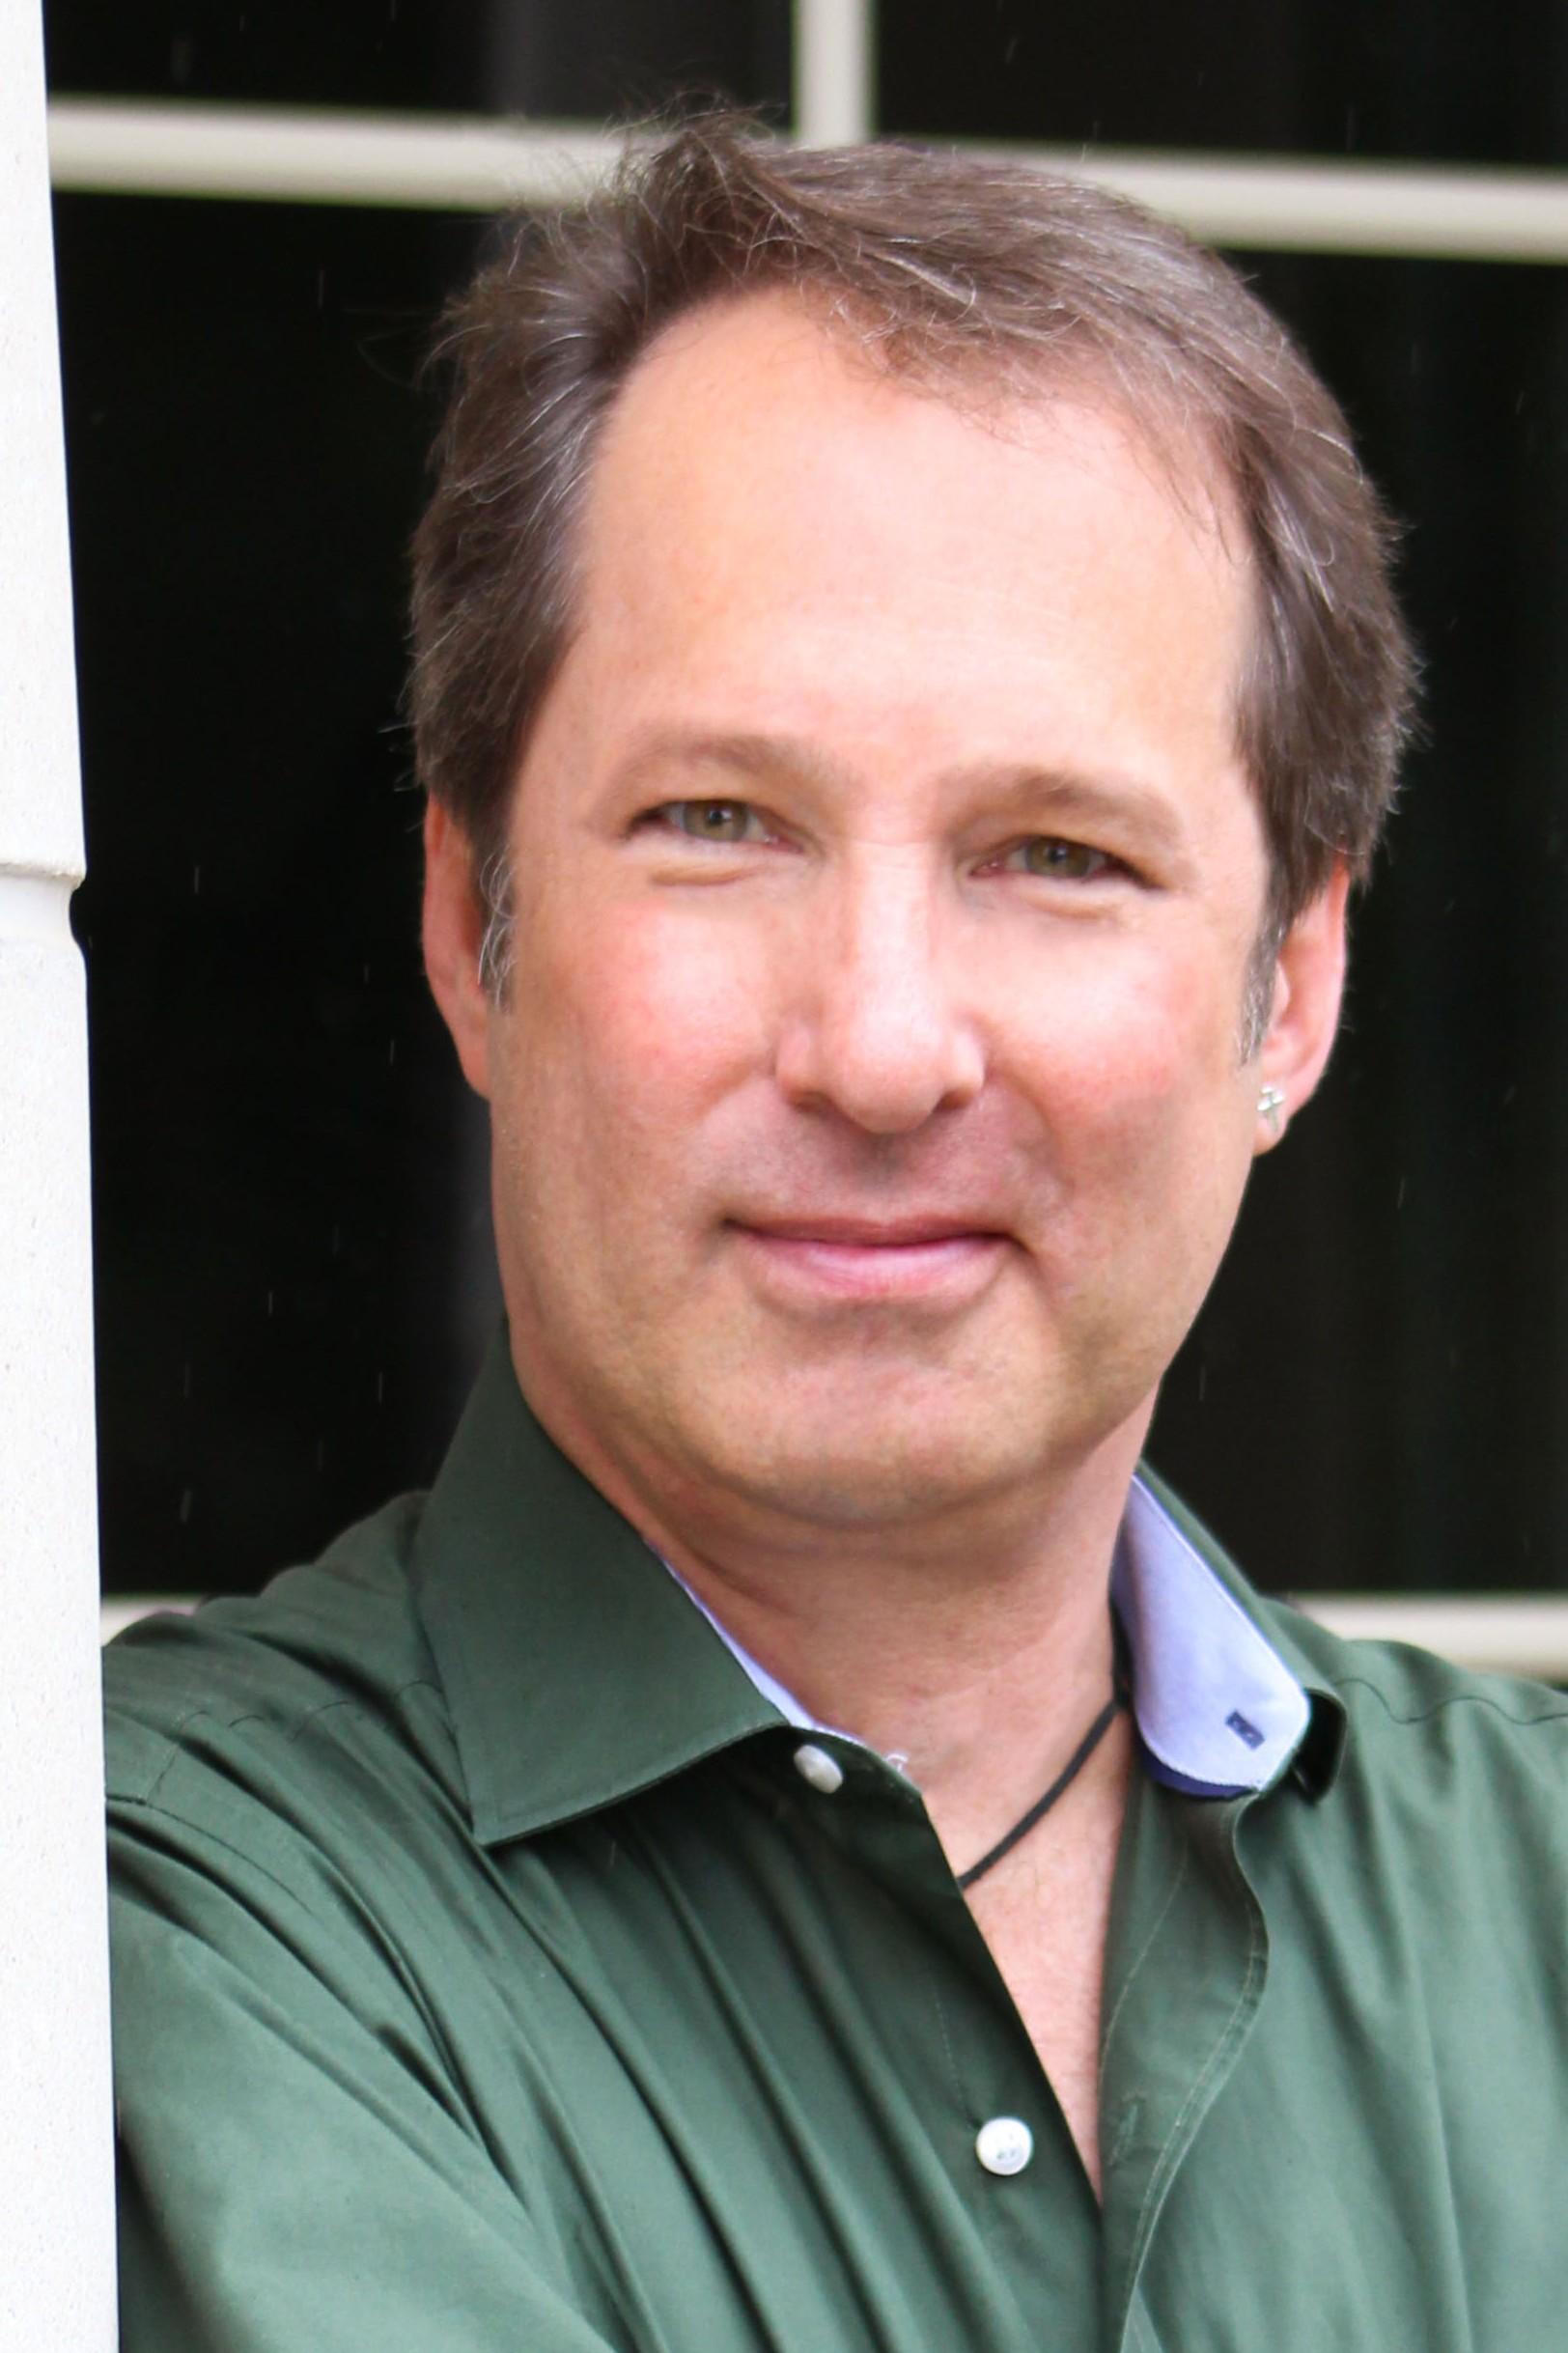 Paul Houghtaling